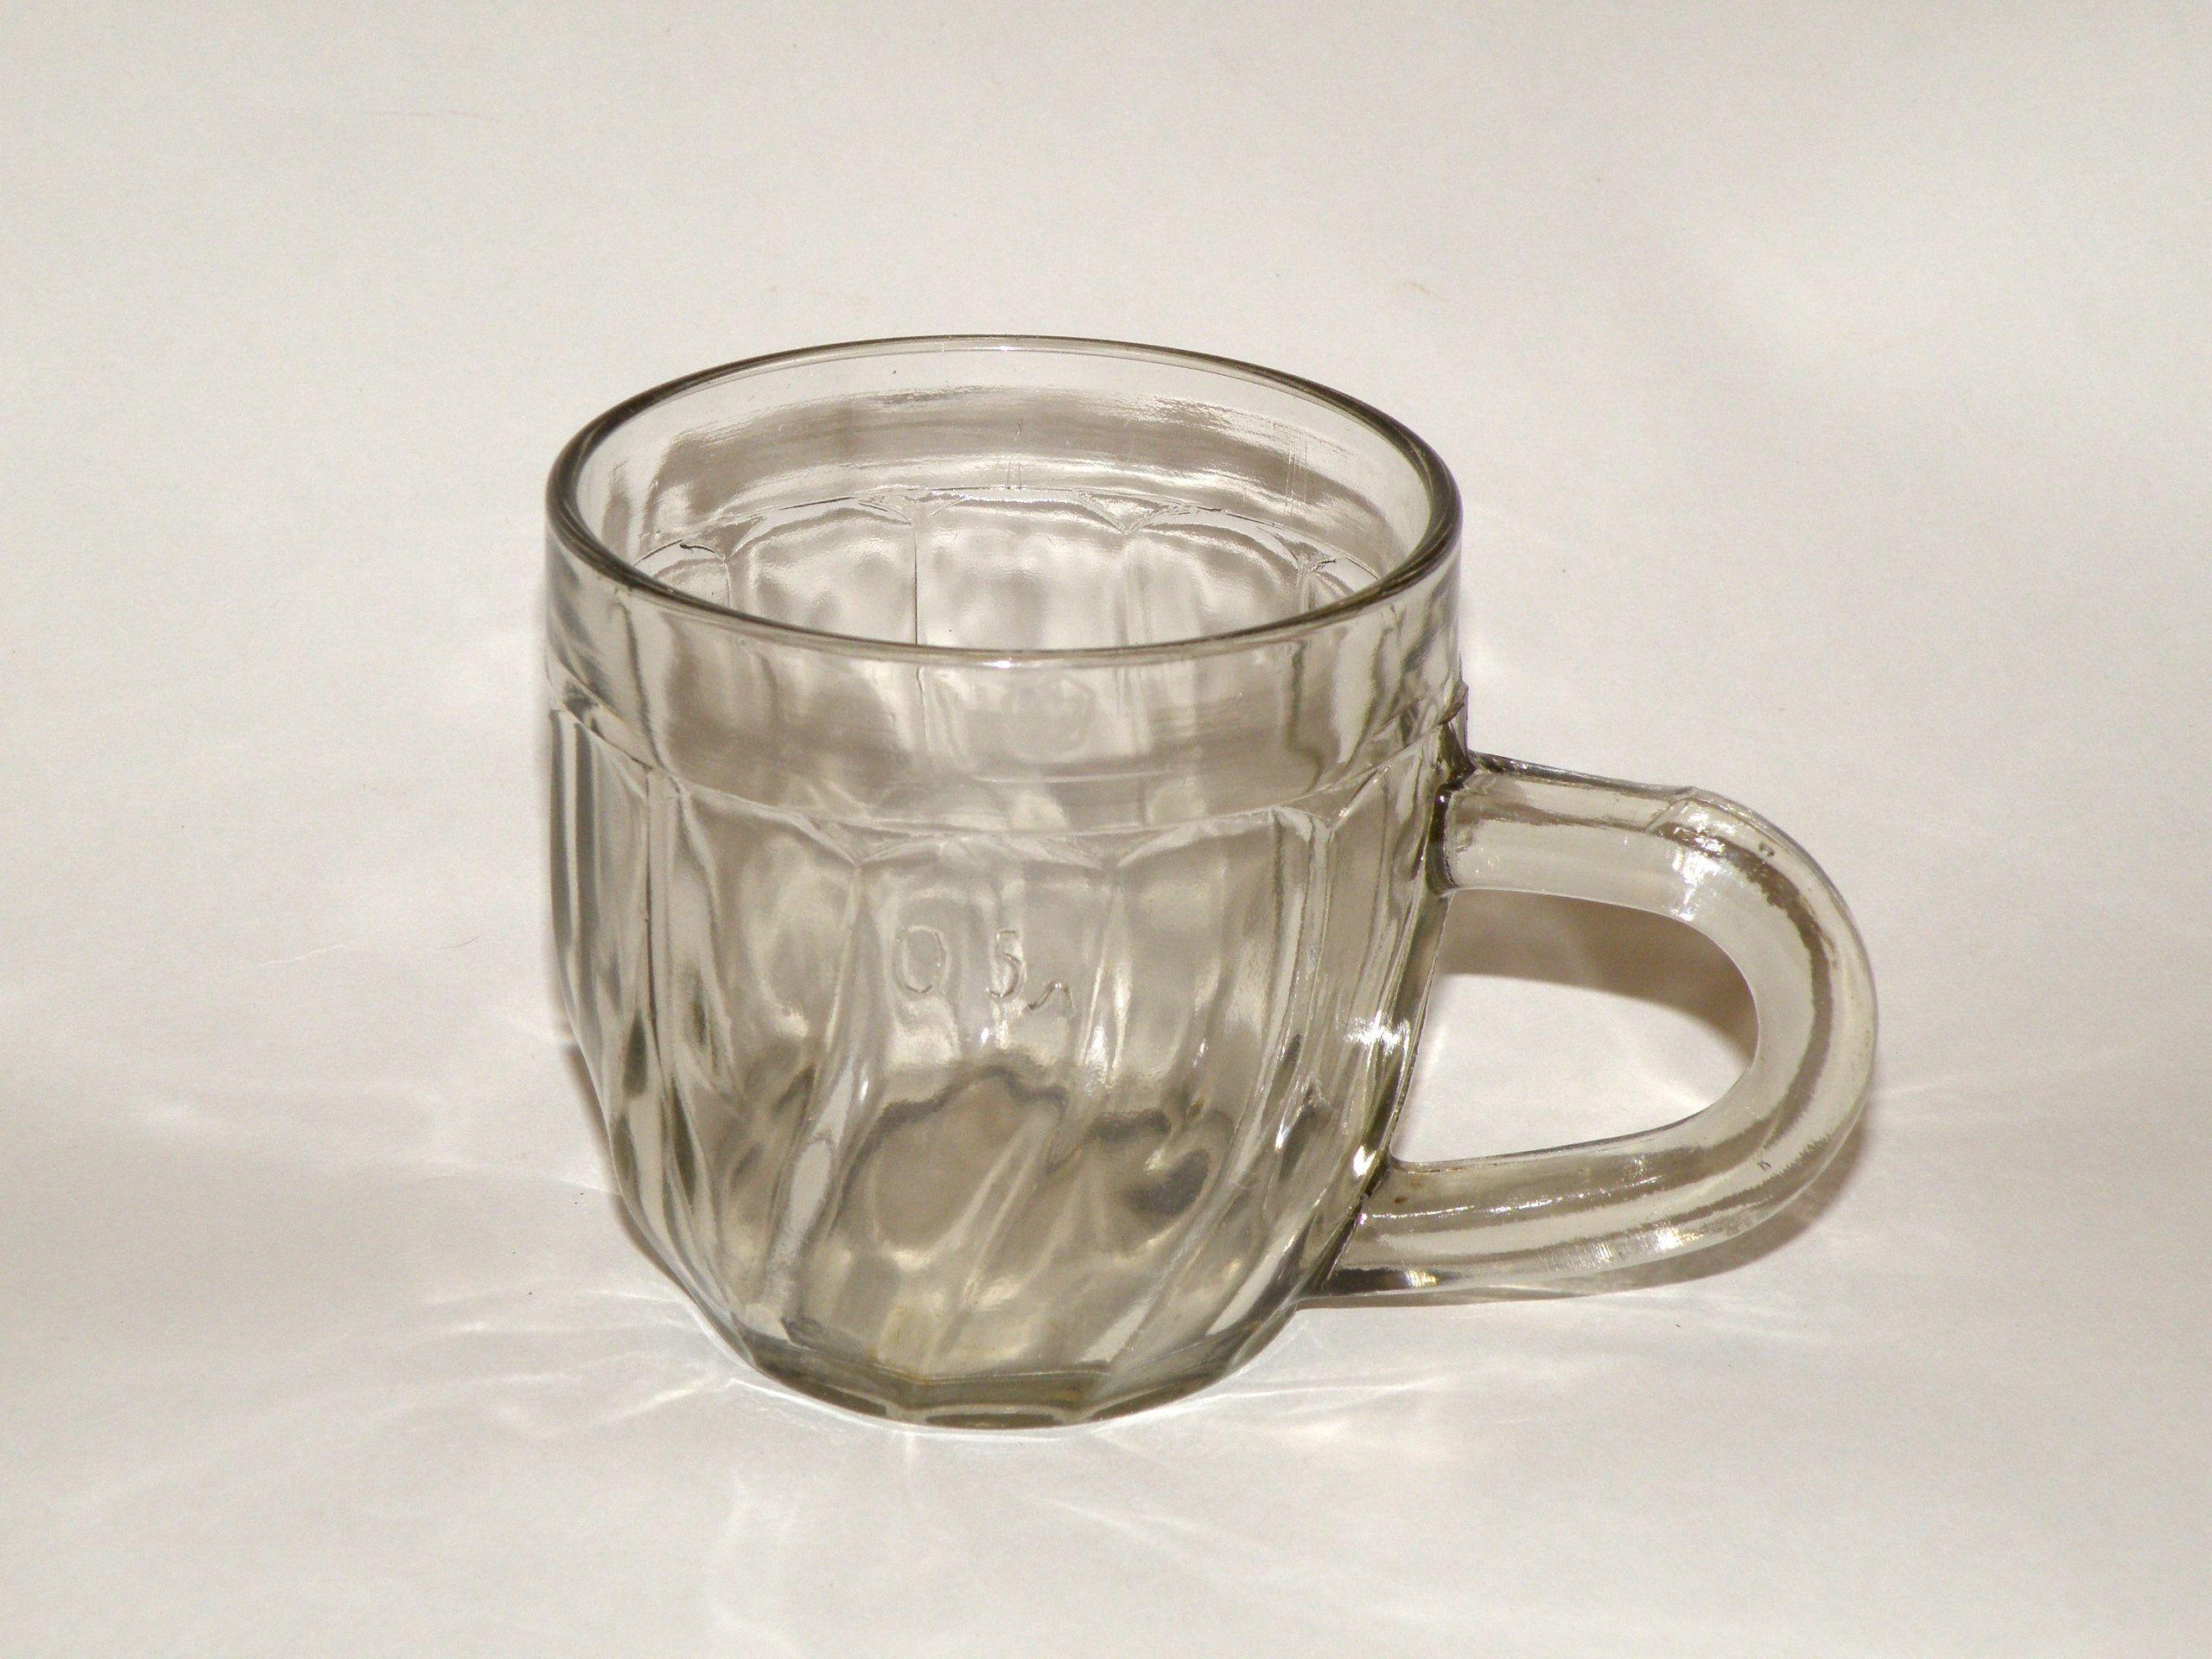 Rare 0 5 L Glass Beer Mug Pint Soviet Large Beer Mug 16 9 Fl Oz